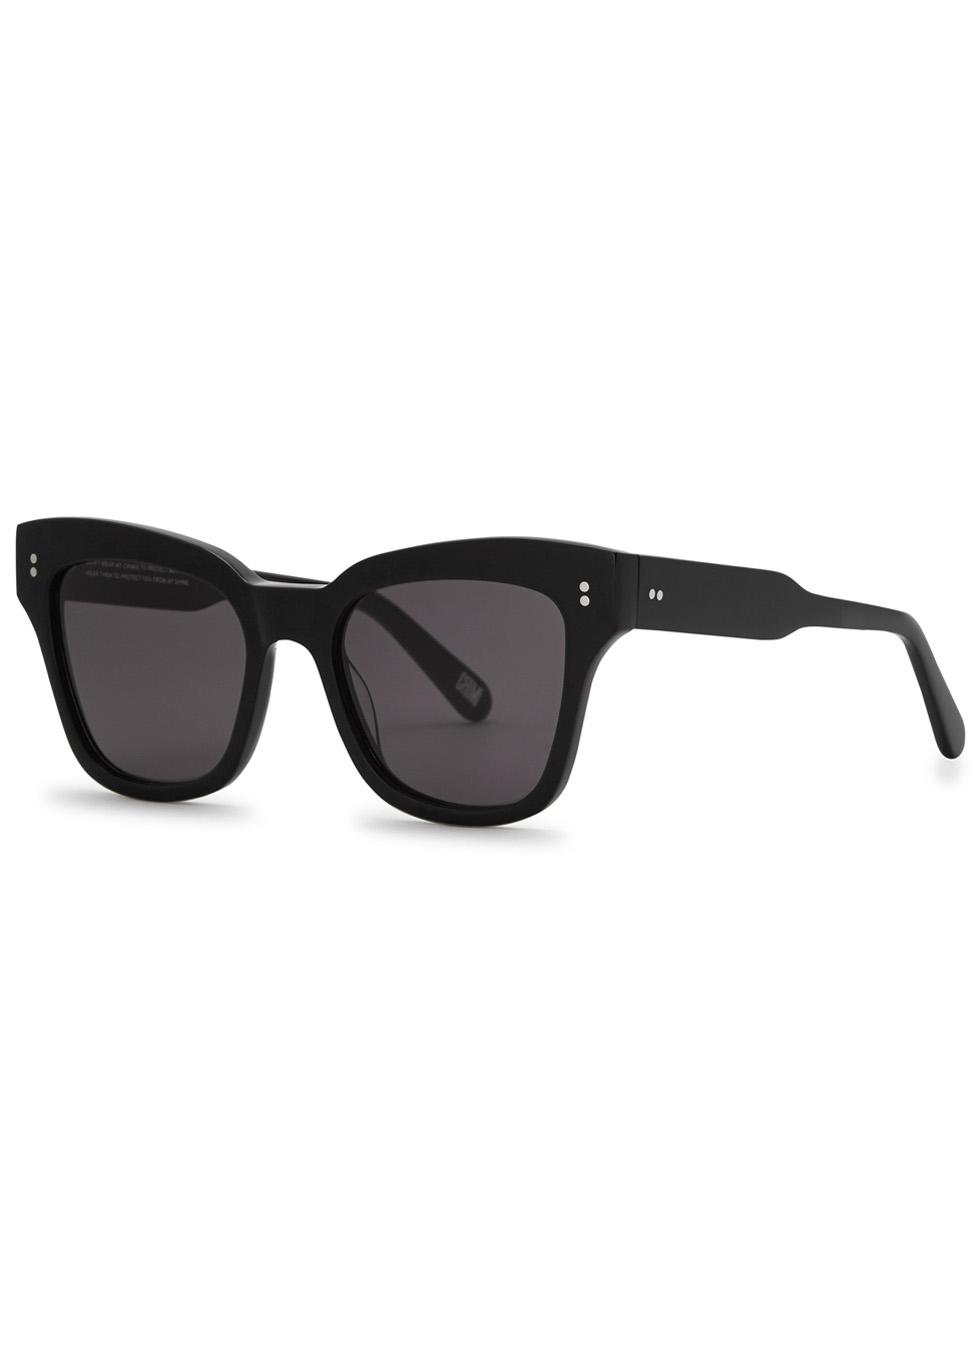 CHIMI 005 BLACK WAYFARER-STYLE SUNGLASSES